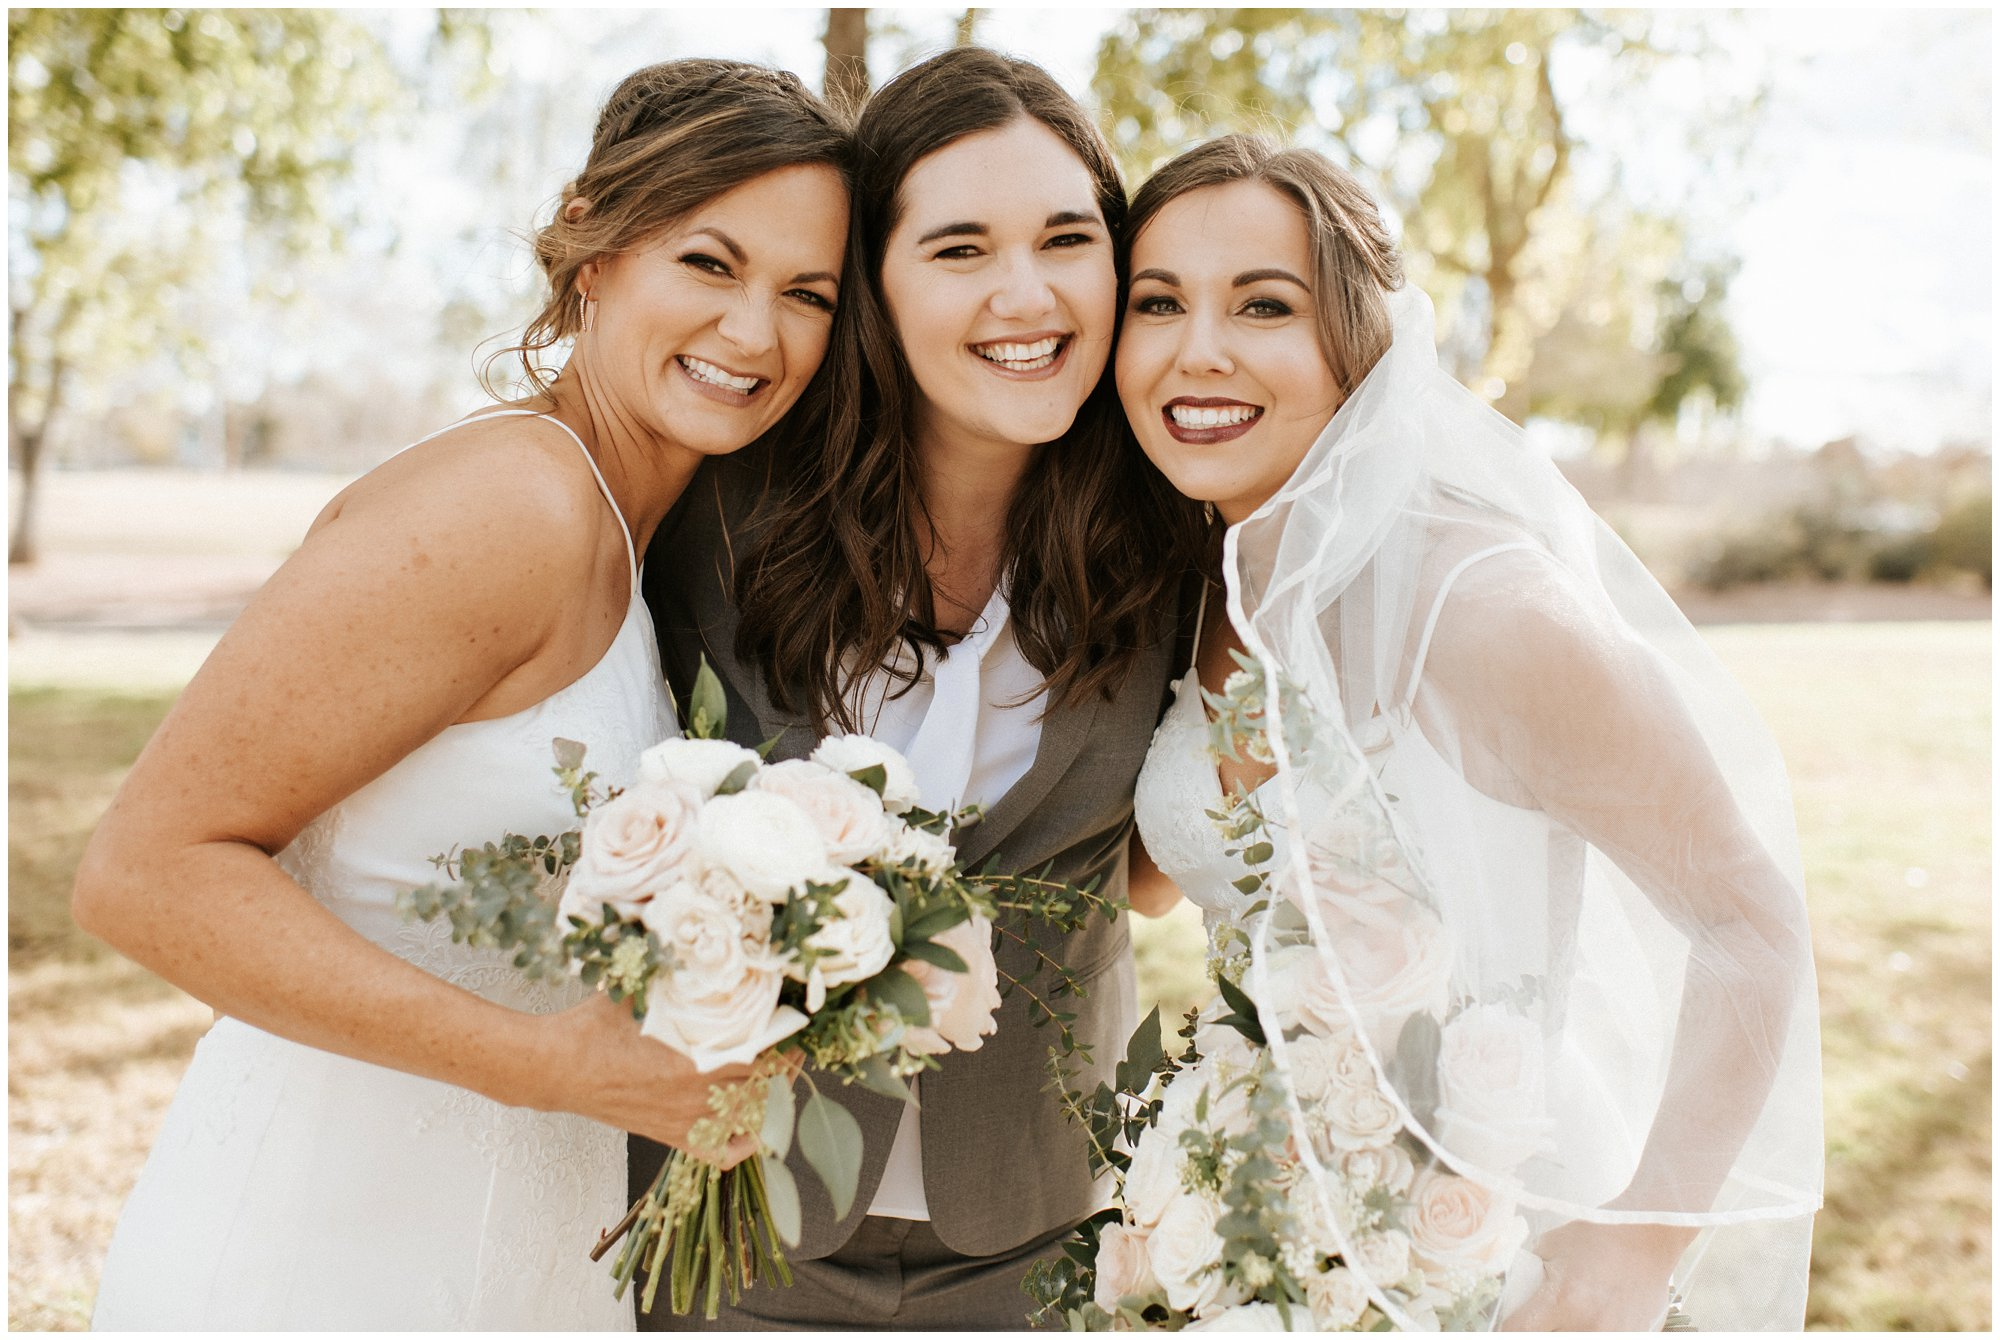 arizona same sex wedding photographer - jenni and lauren wedding the islands clubhouse_0038.jpg